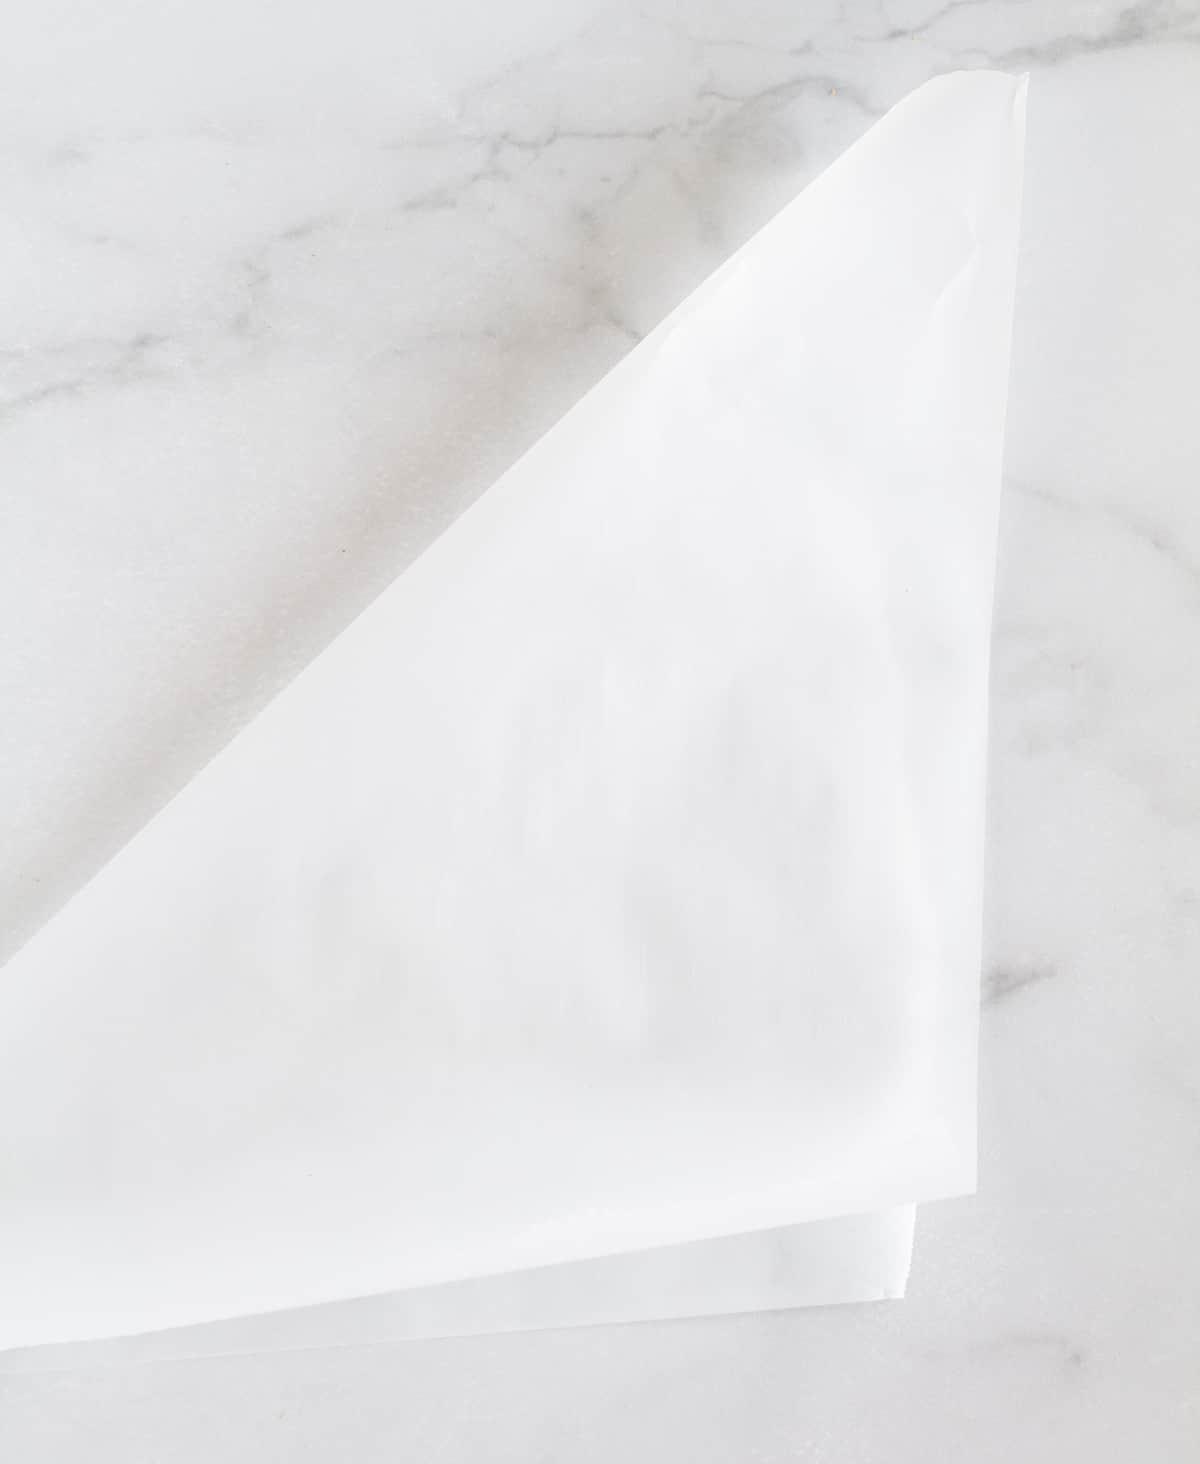 folded piece of parchment paper